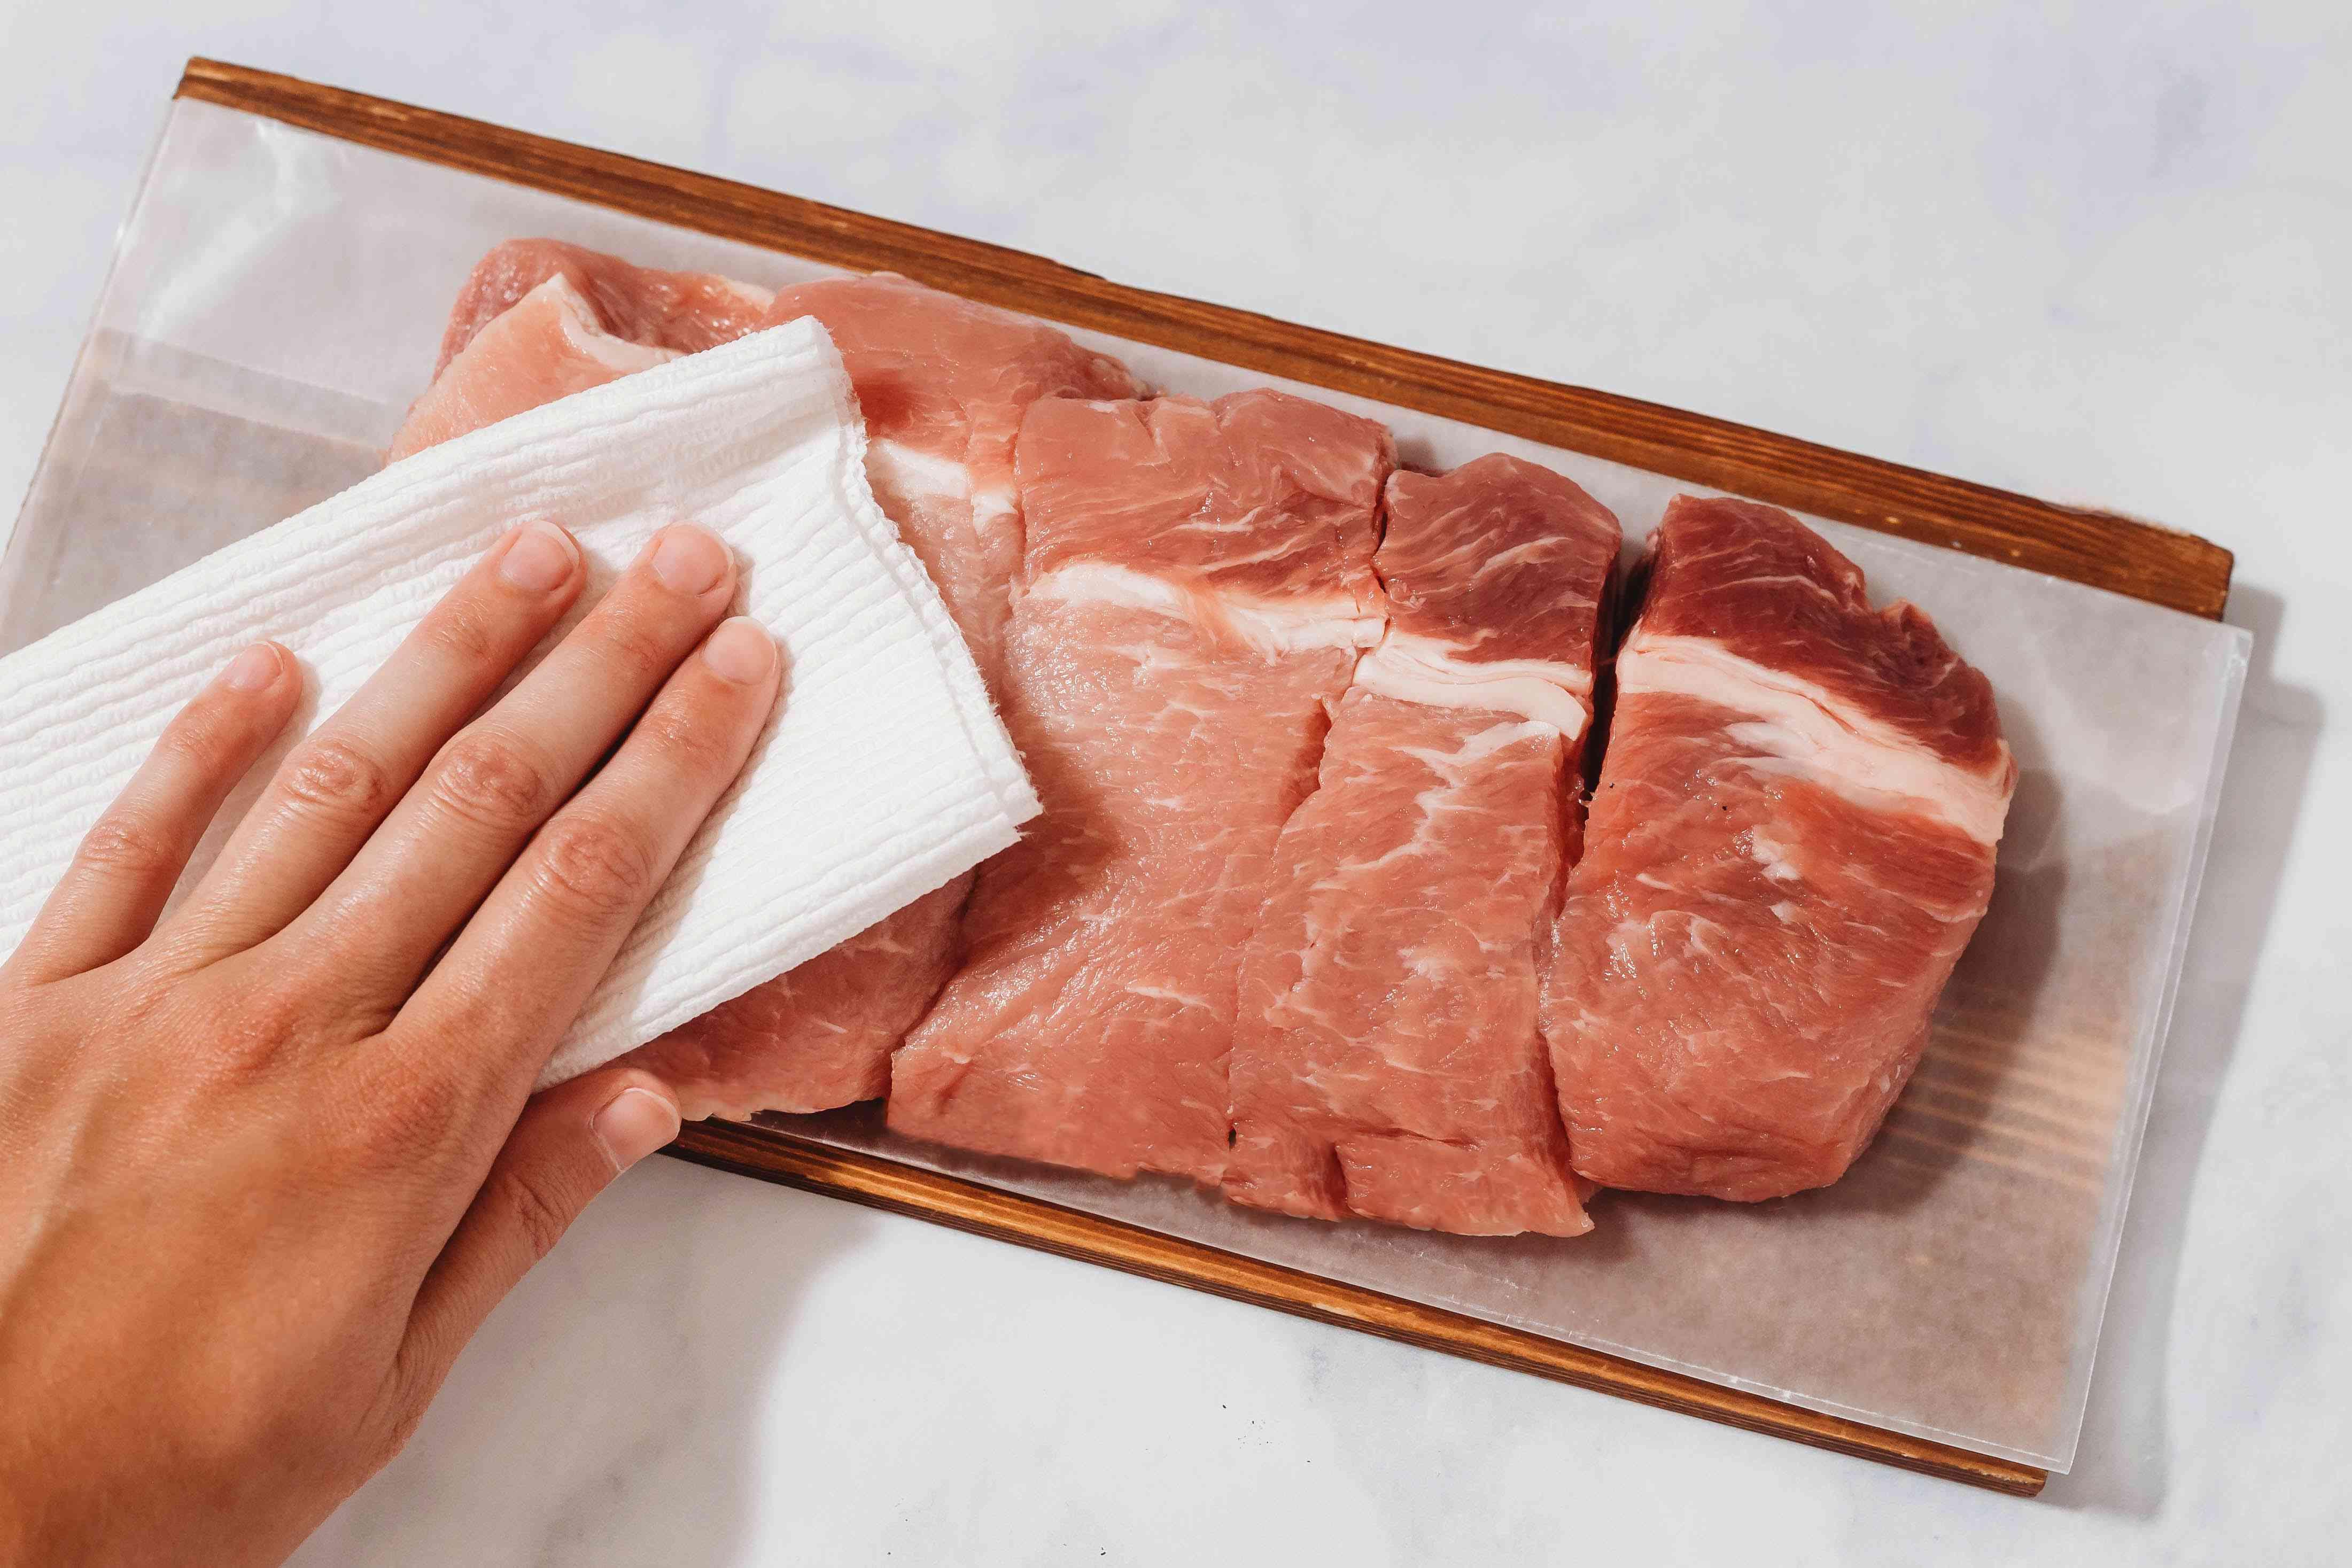 Trim meat